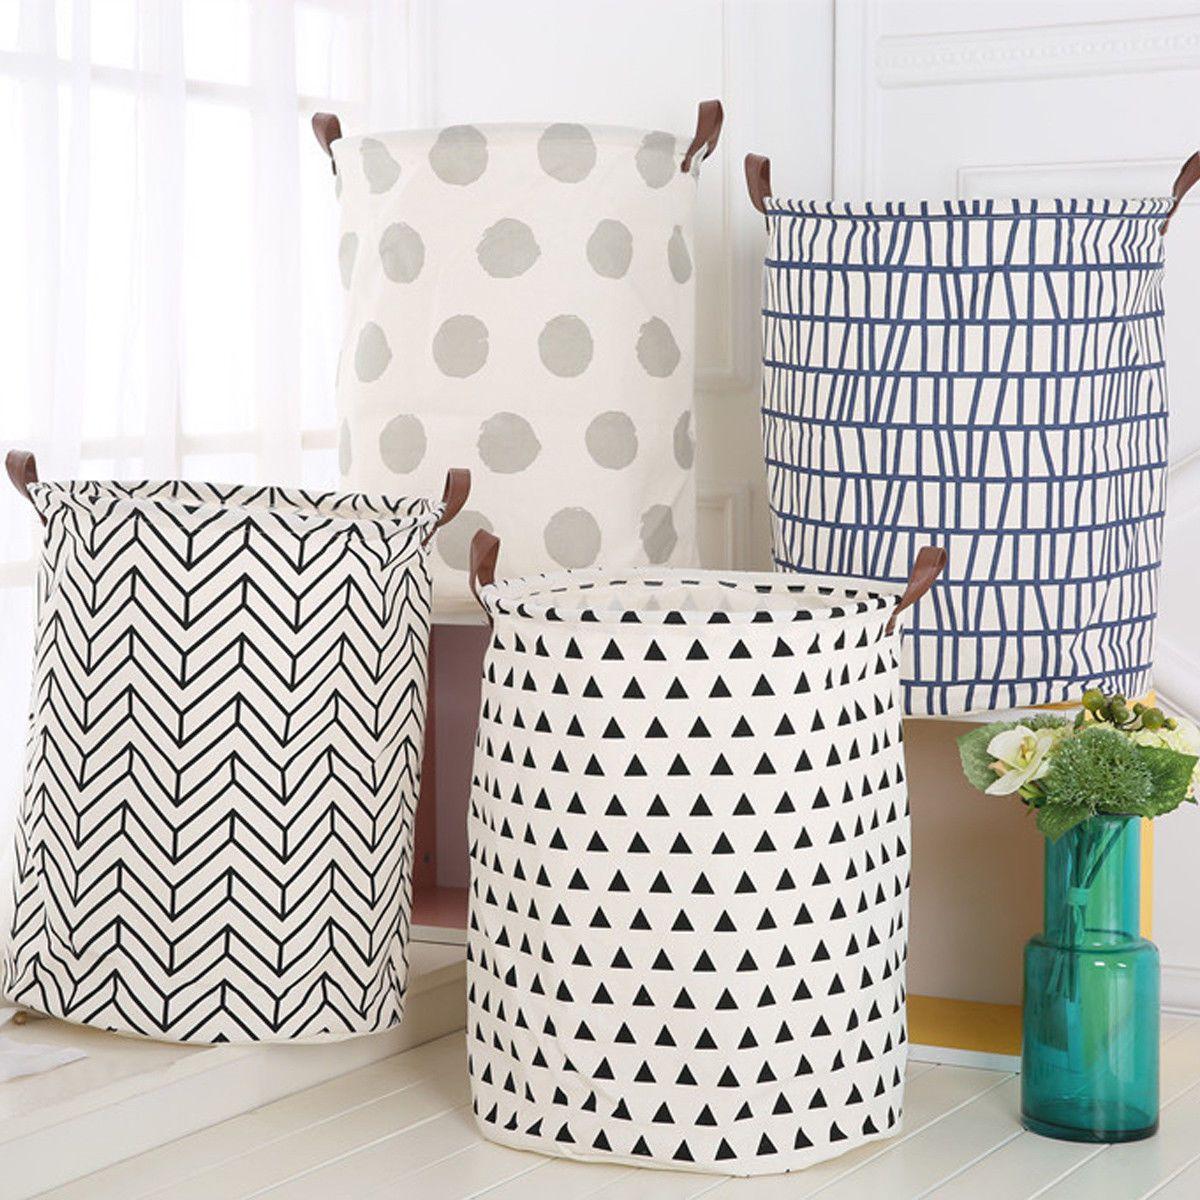 7 55 Aud Cotton Washing Clothes Laundry Basket Bag Hamper